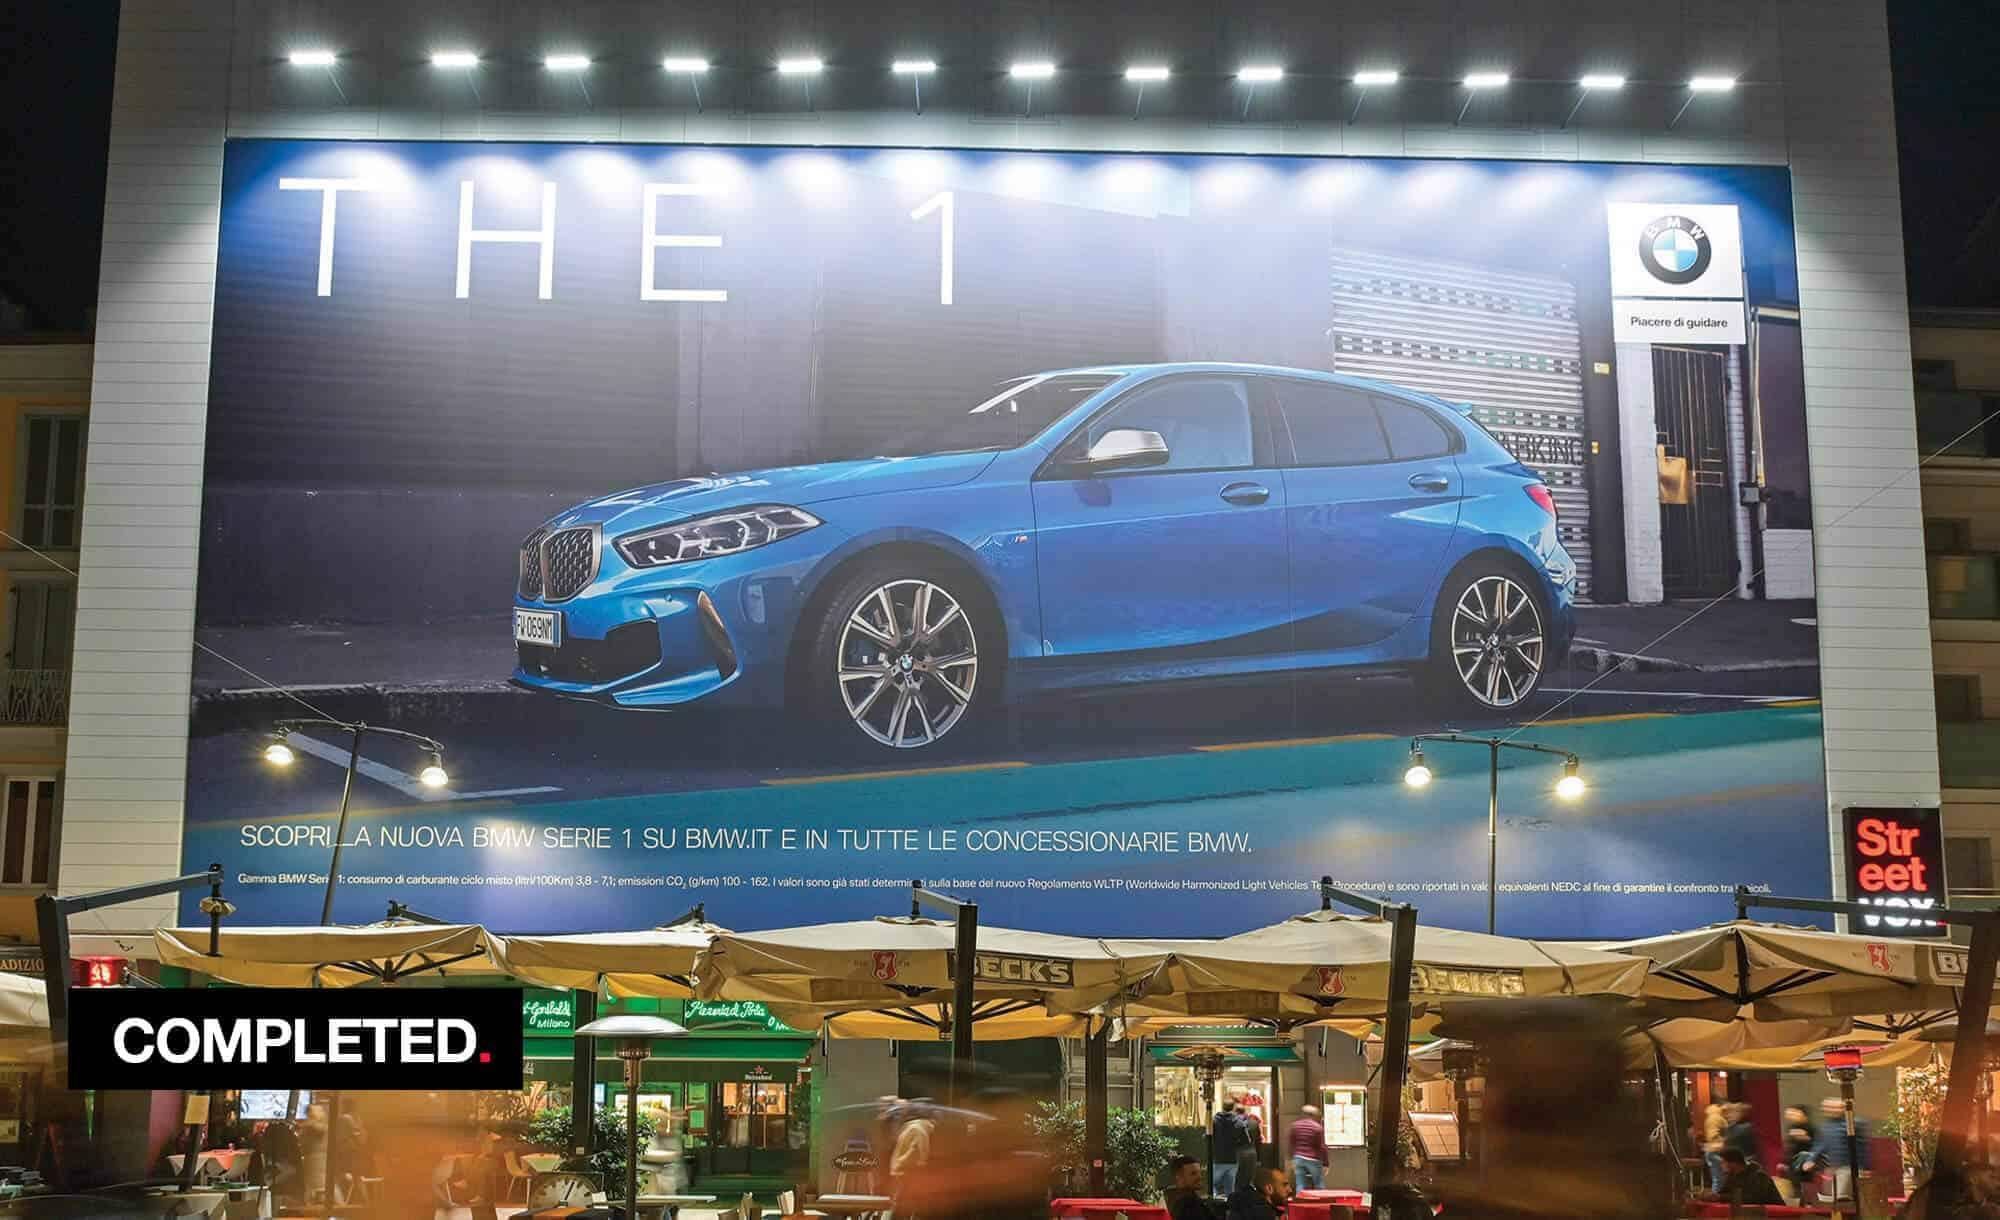 Maxi Affisione a Milano in Corso Como 6 con BMW (Automotive)